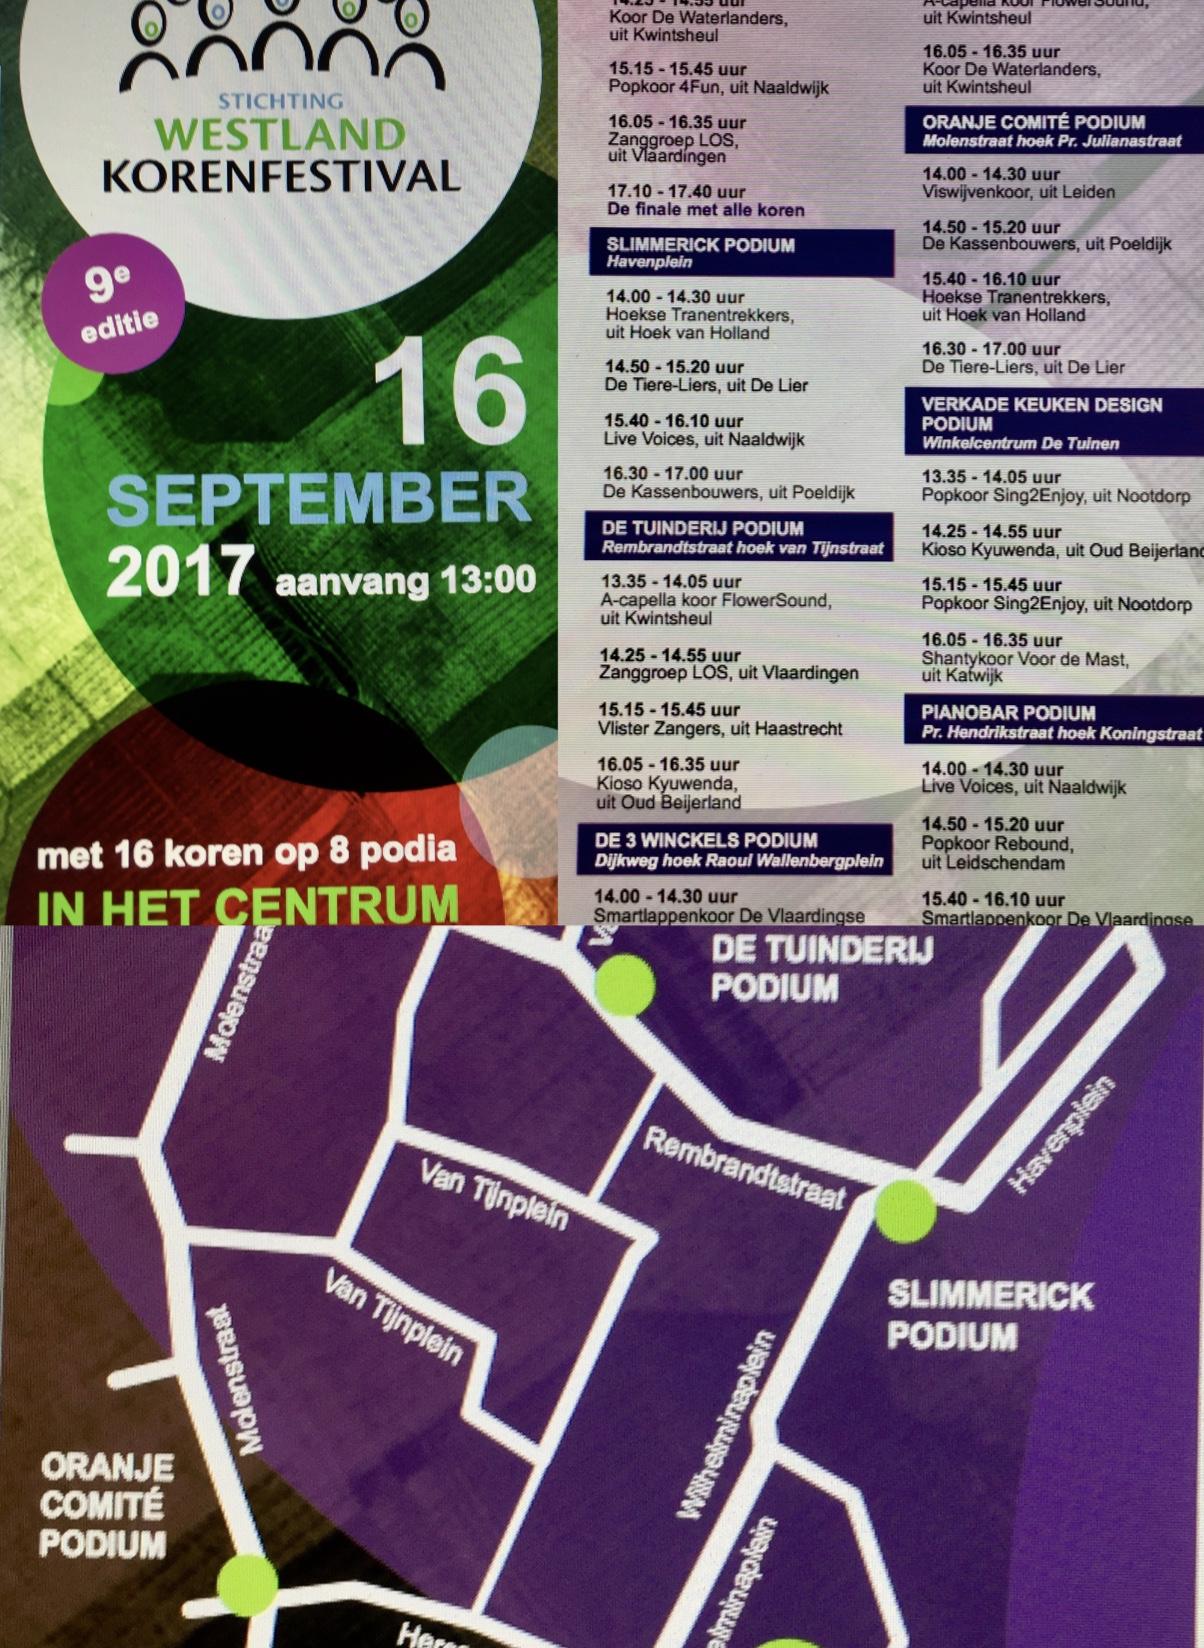 Westland korenfestival 16 september